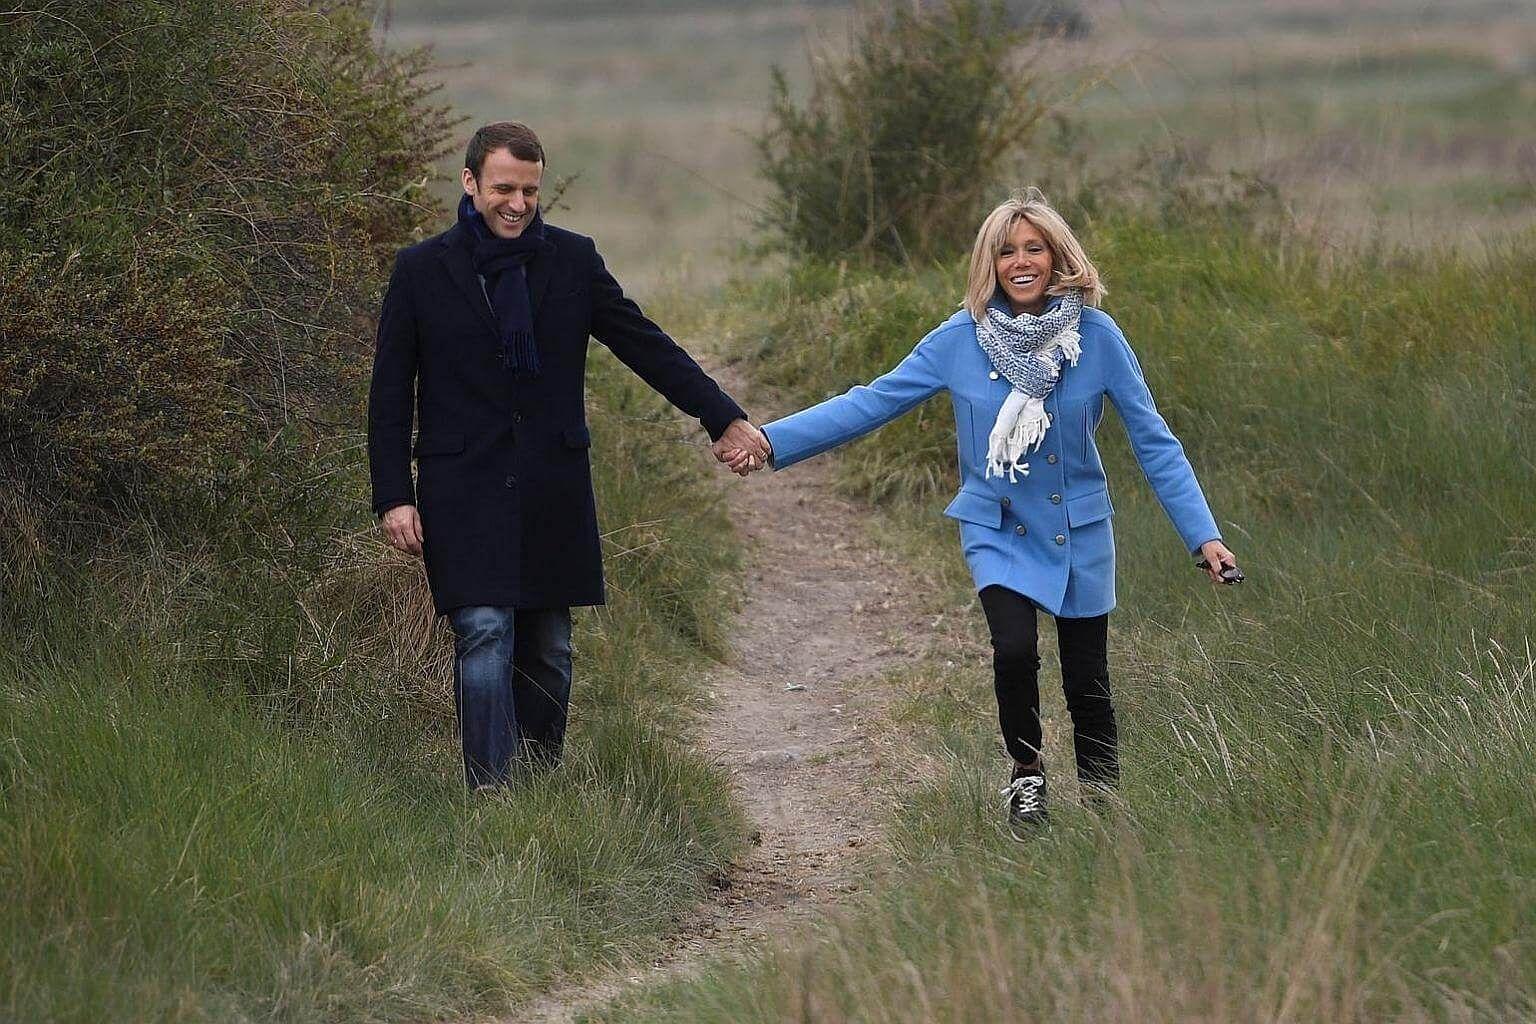 Macron brigitte marie-claude Does Brigitte